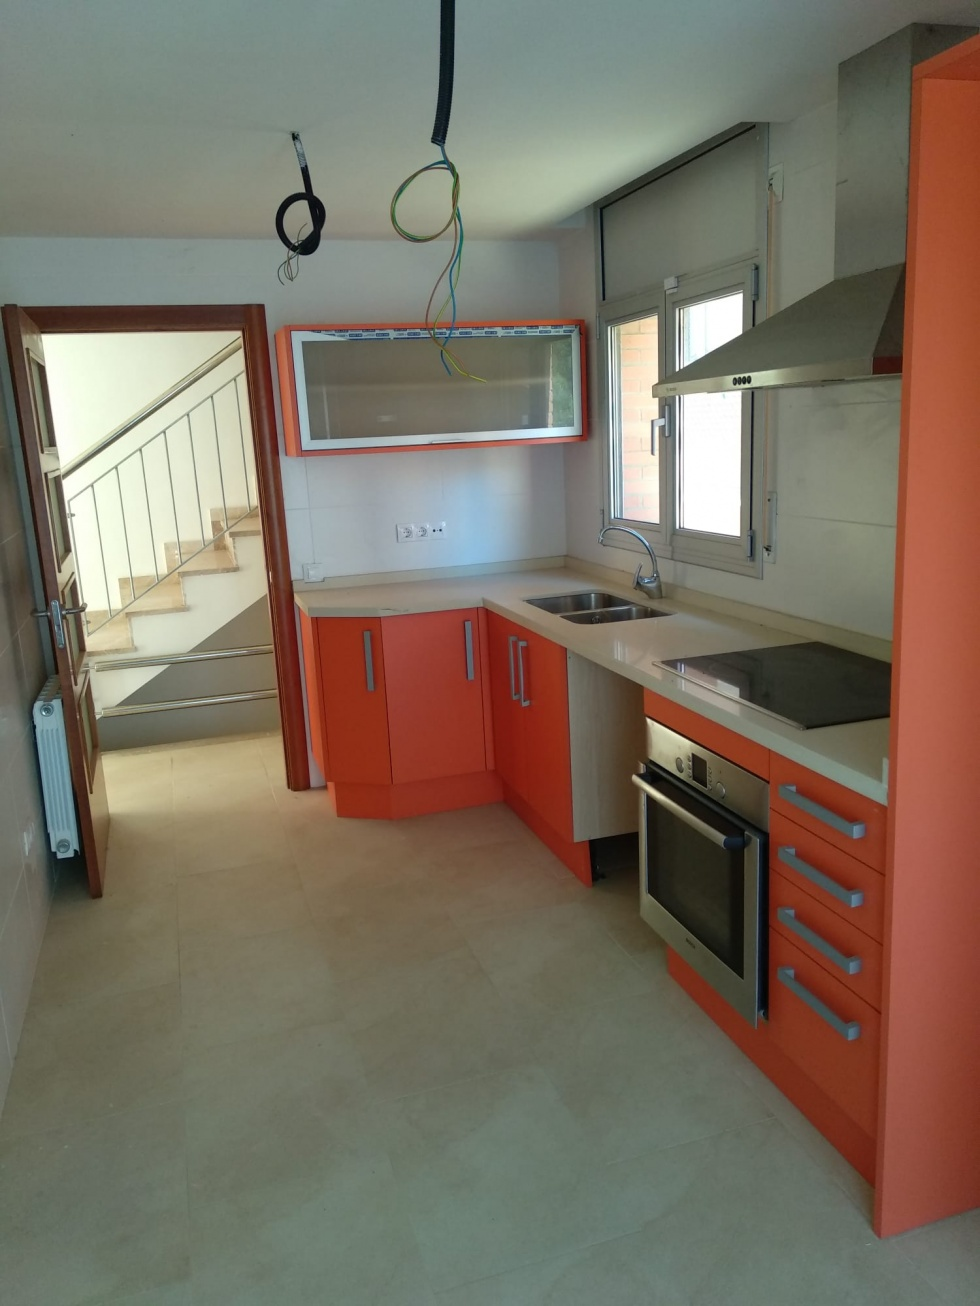 <h2>Casa adosada en REUS <small><small>(ref.20963)</small></small></h2><h3>320.000 €</h3>